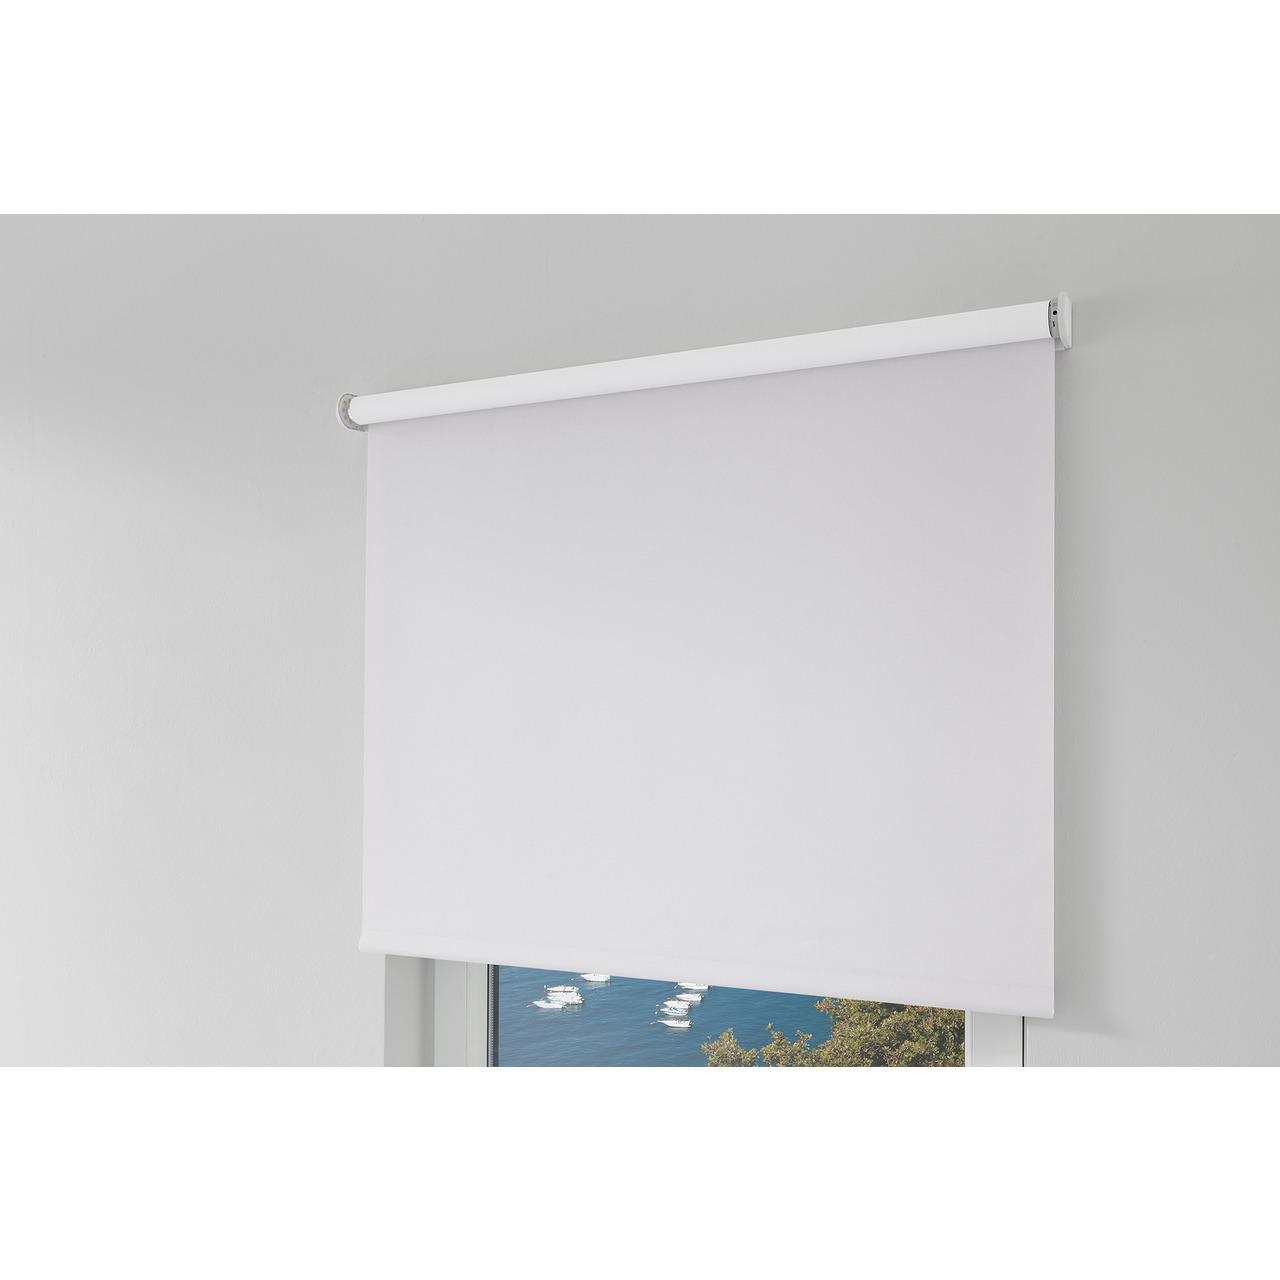 Erfal Smartcontrol Rollo by Homematic IP- 140 x 230 cm (B x H)- blickdicht abdunkelnd weiss